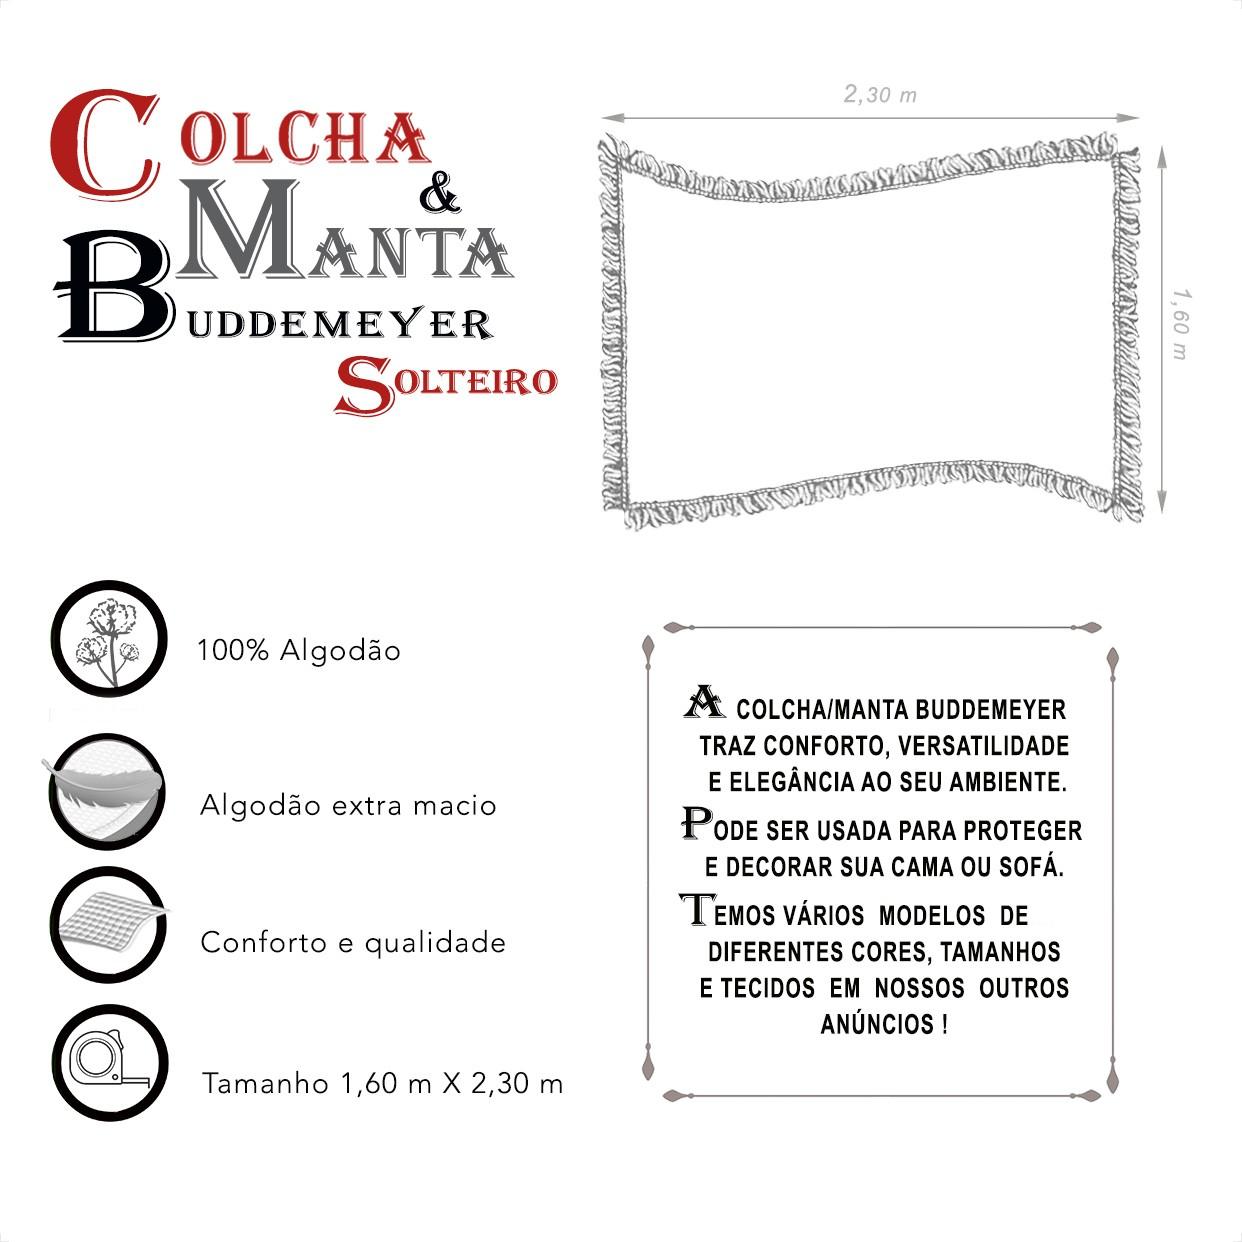 Manta e Colcha Buddemeyer Solteiro Grafite 1,60m x 2,30m